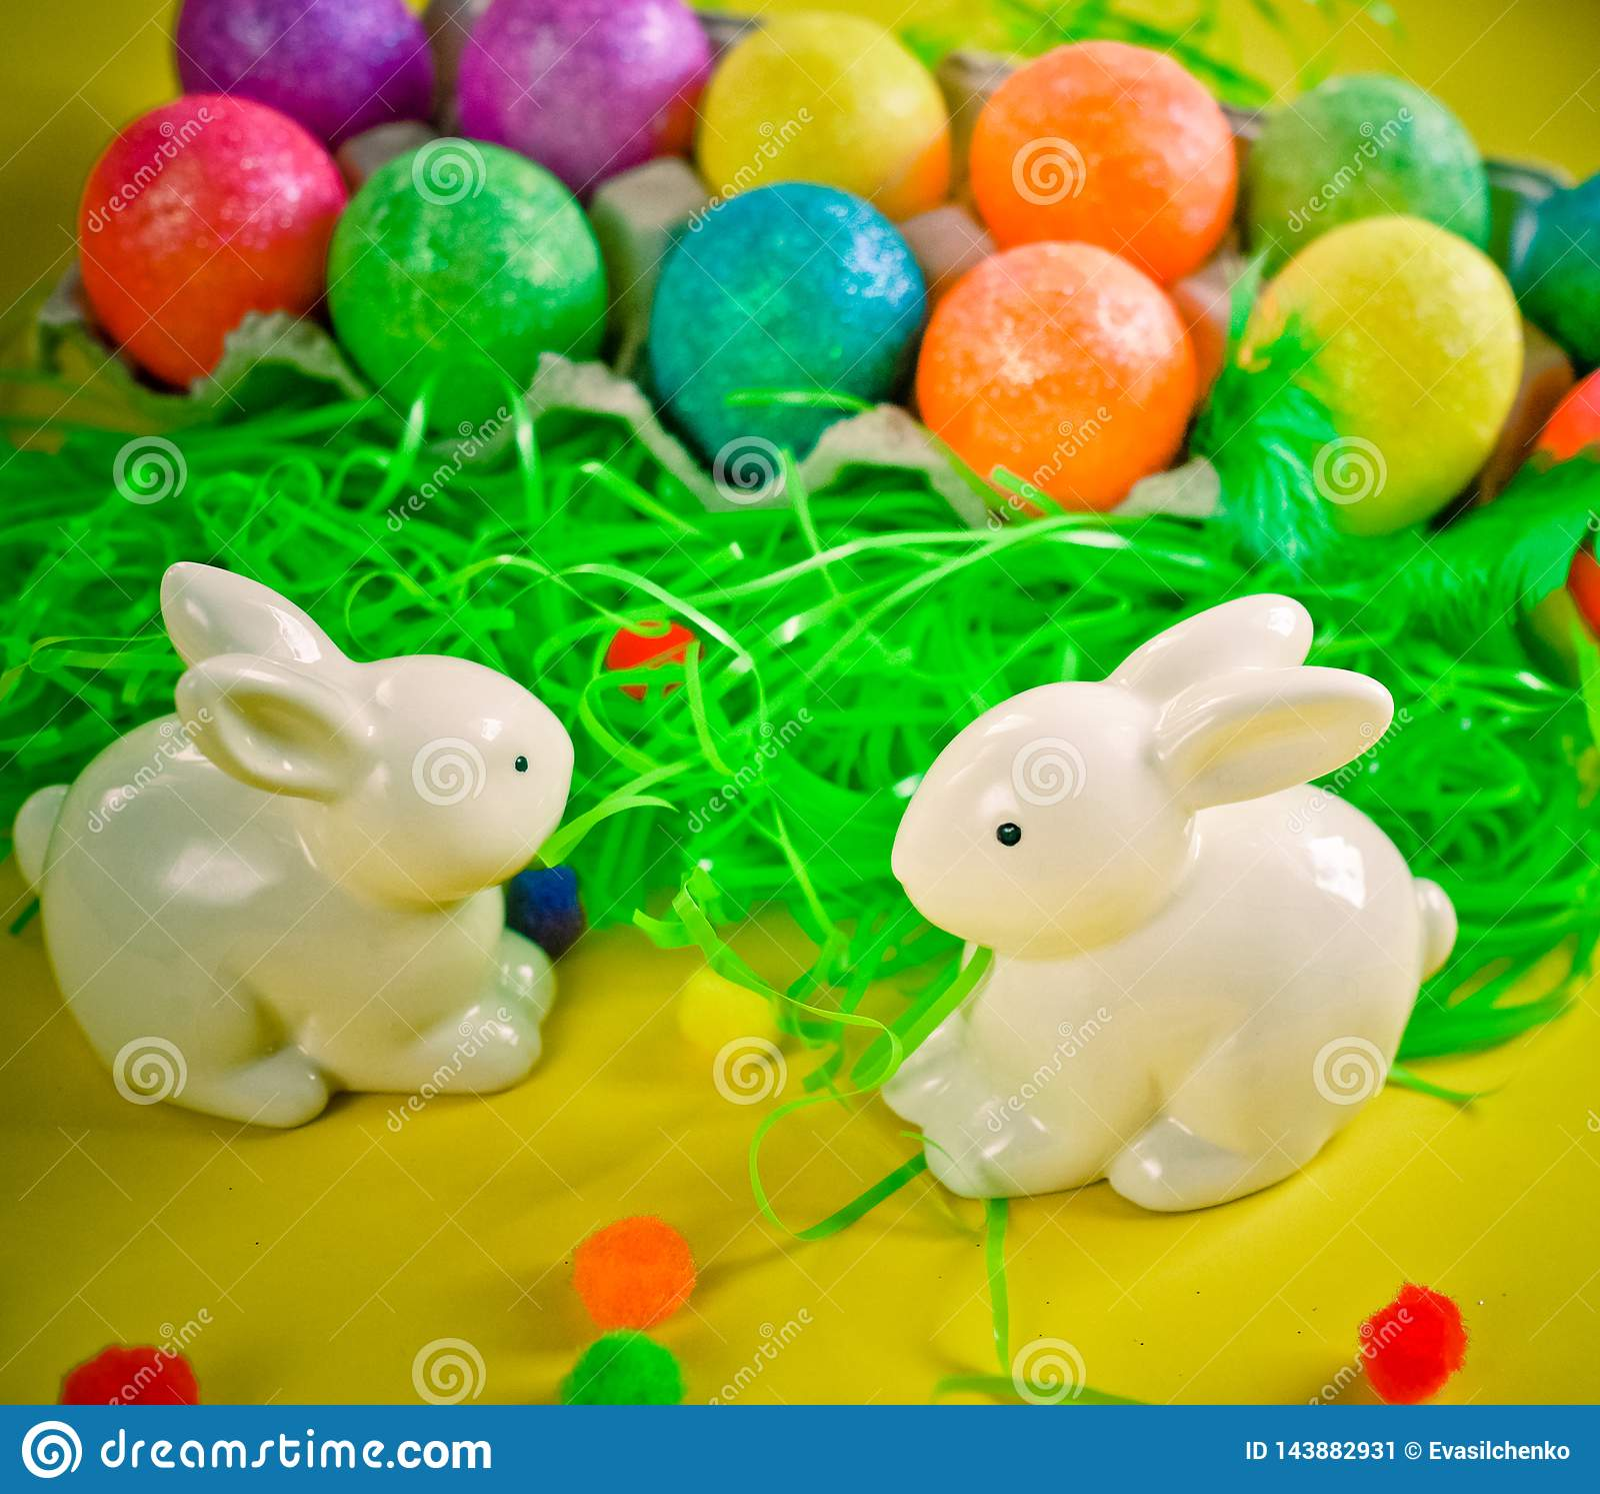 Zwei weiße porctlain Kaninchen nahe bunten hellen Eiern